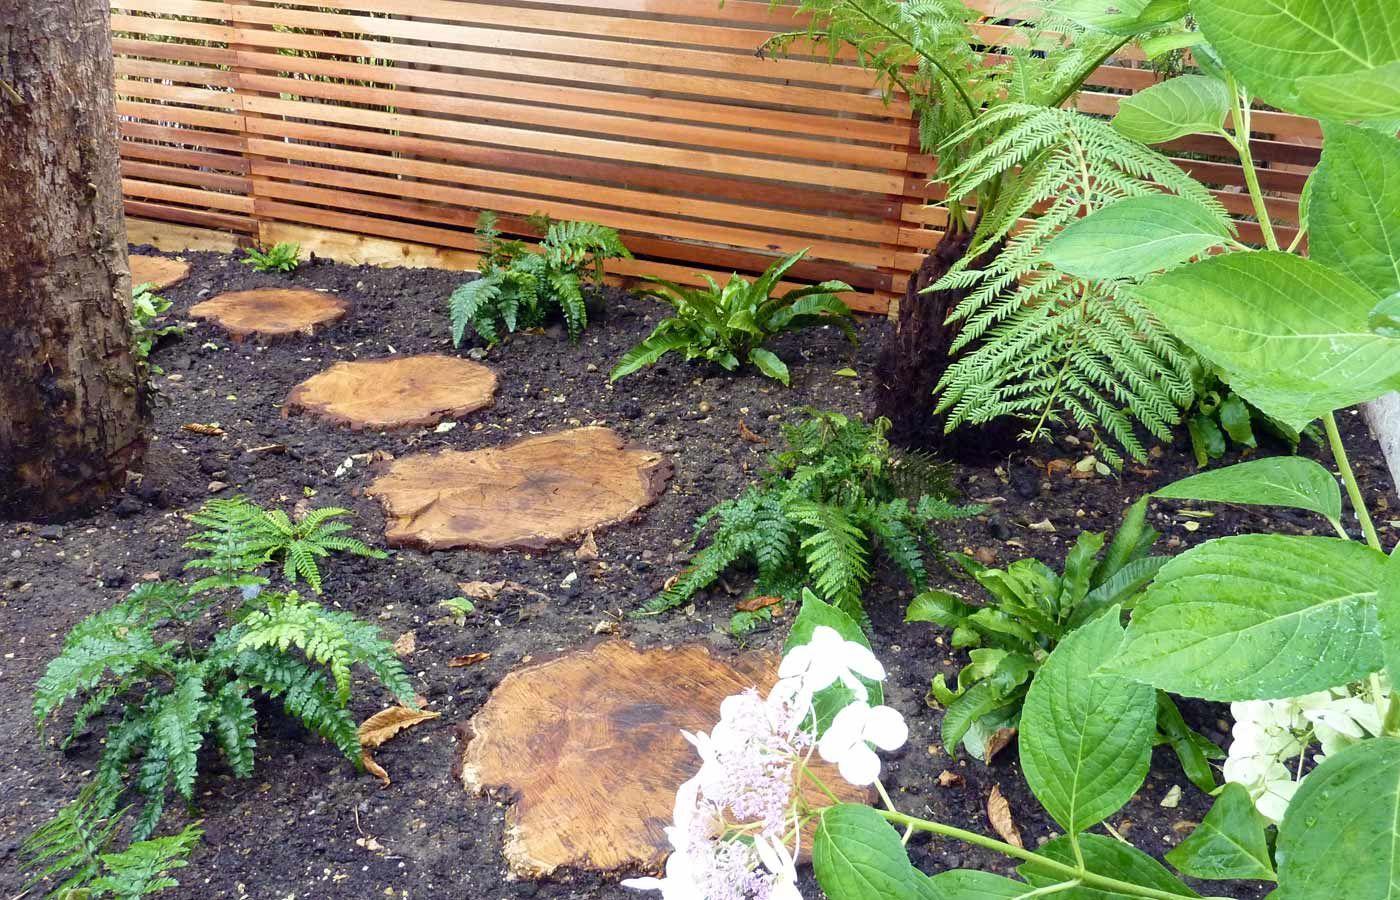 Wooden stepping stones detail view garden pinterest garden wooden stepping stones detail view workwithnaturefo